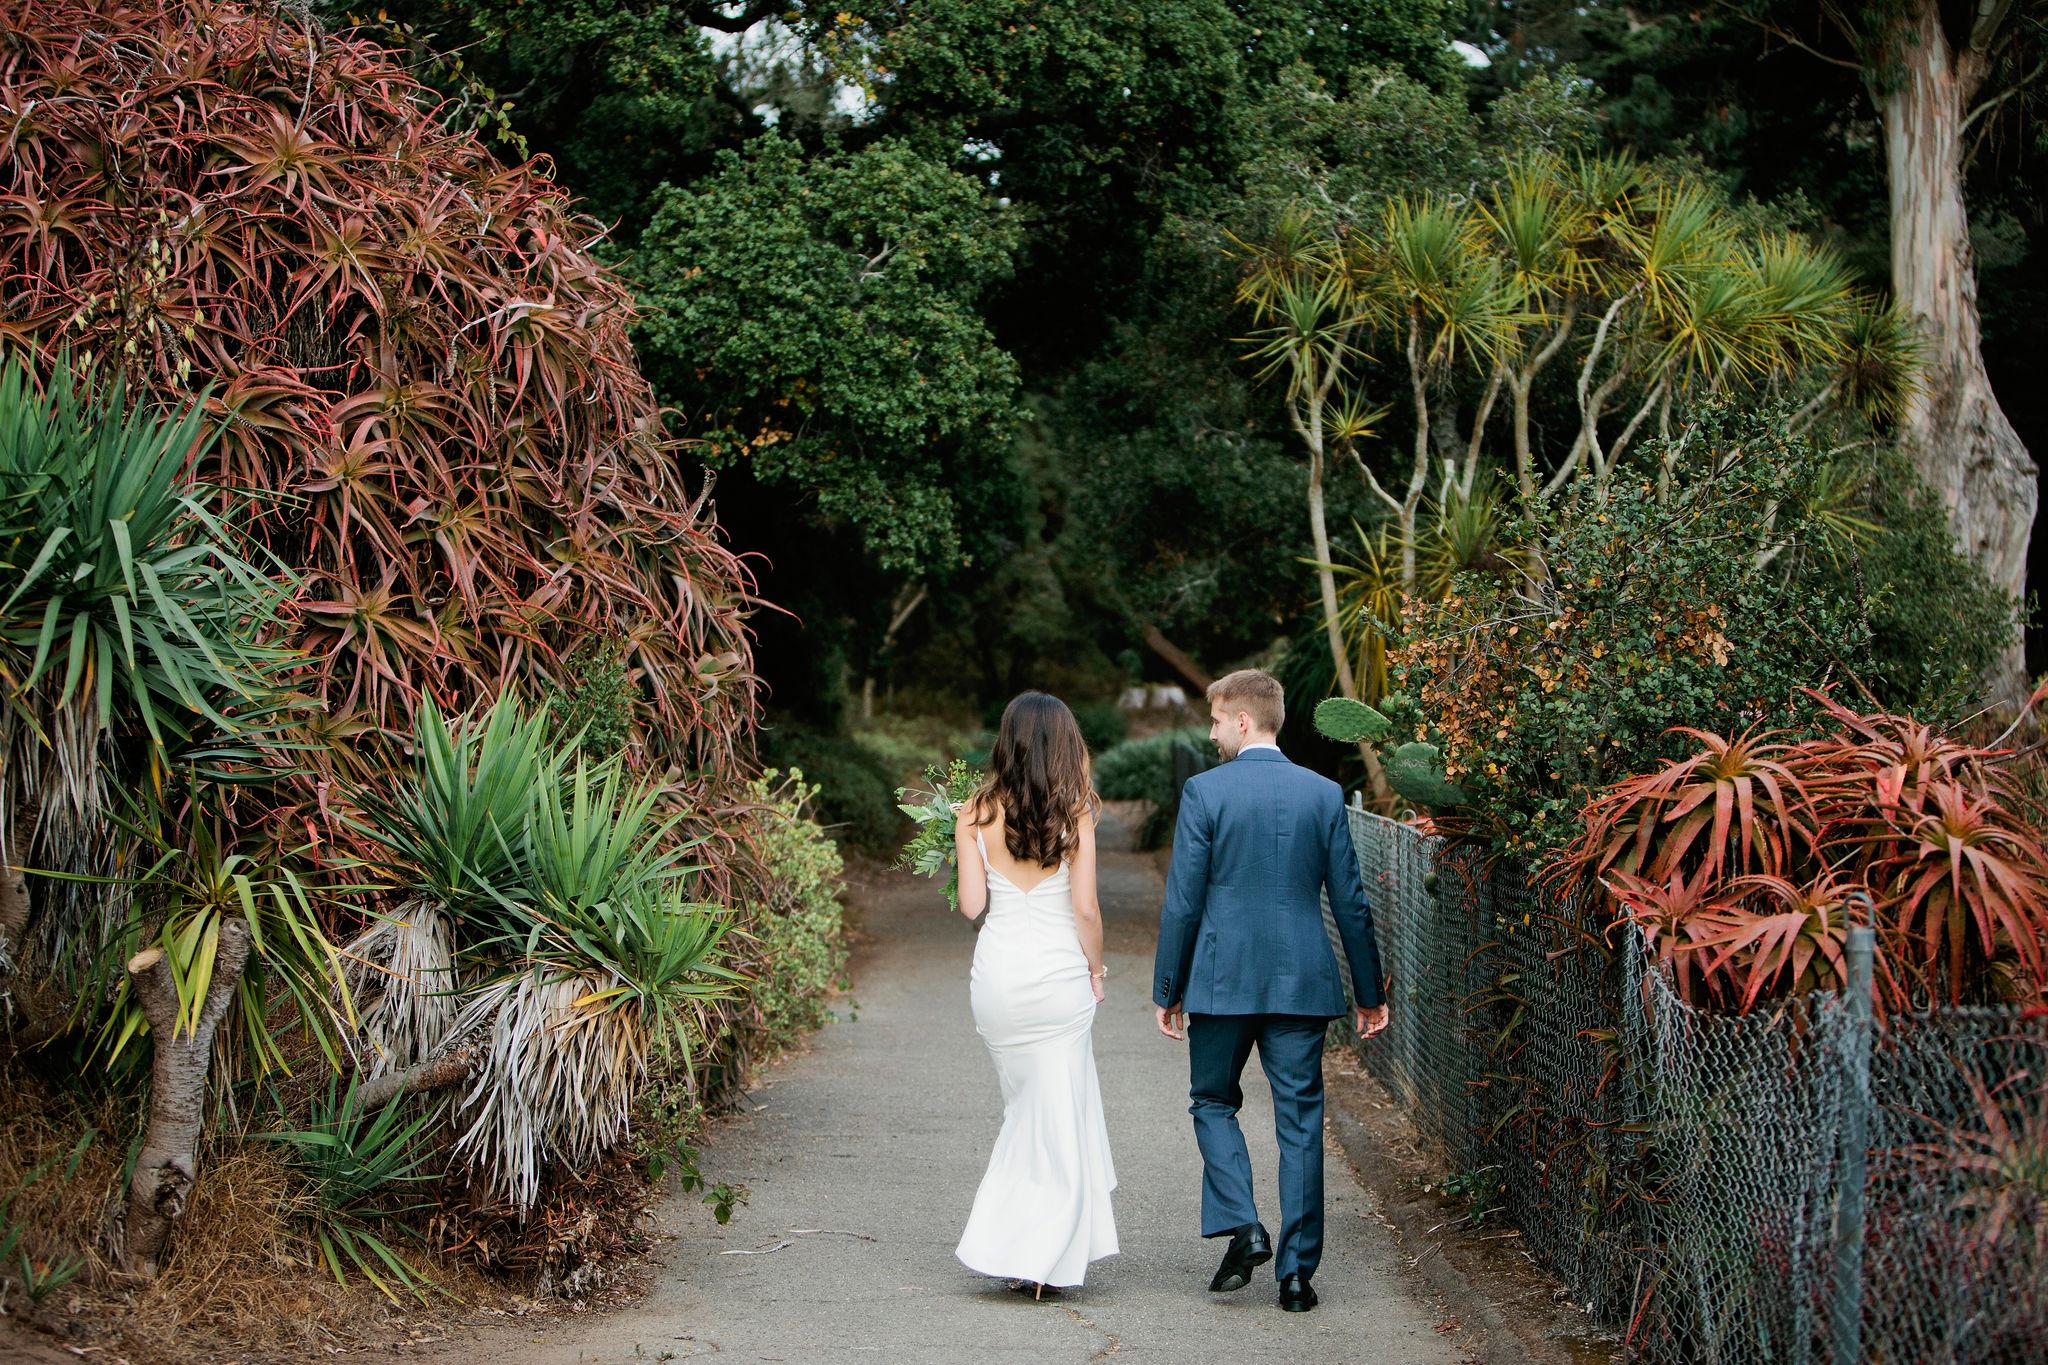 Conservatory-of-Flowers-Wedding-23.JPG